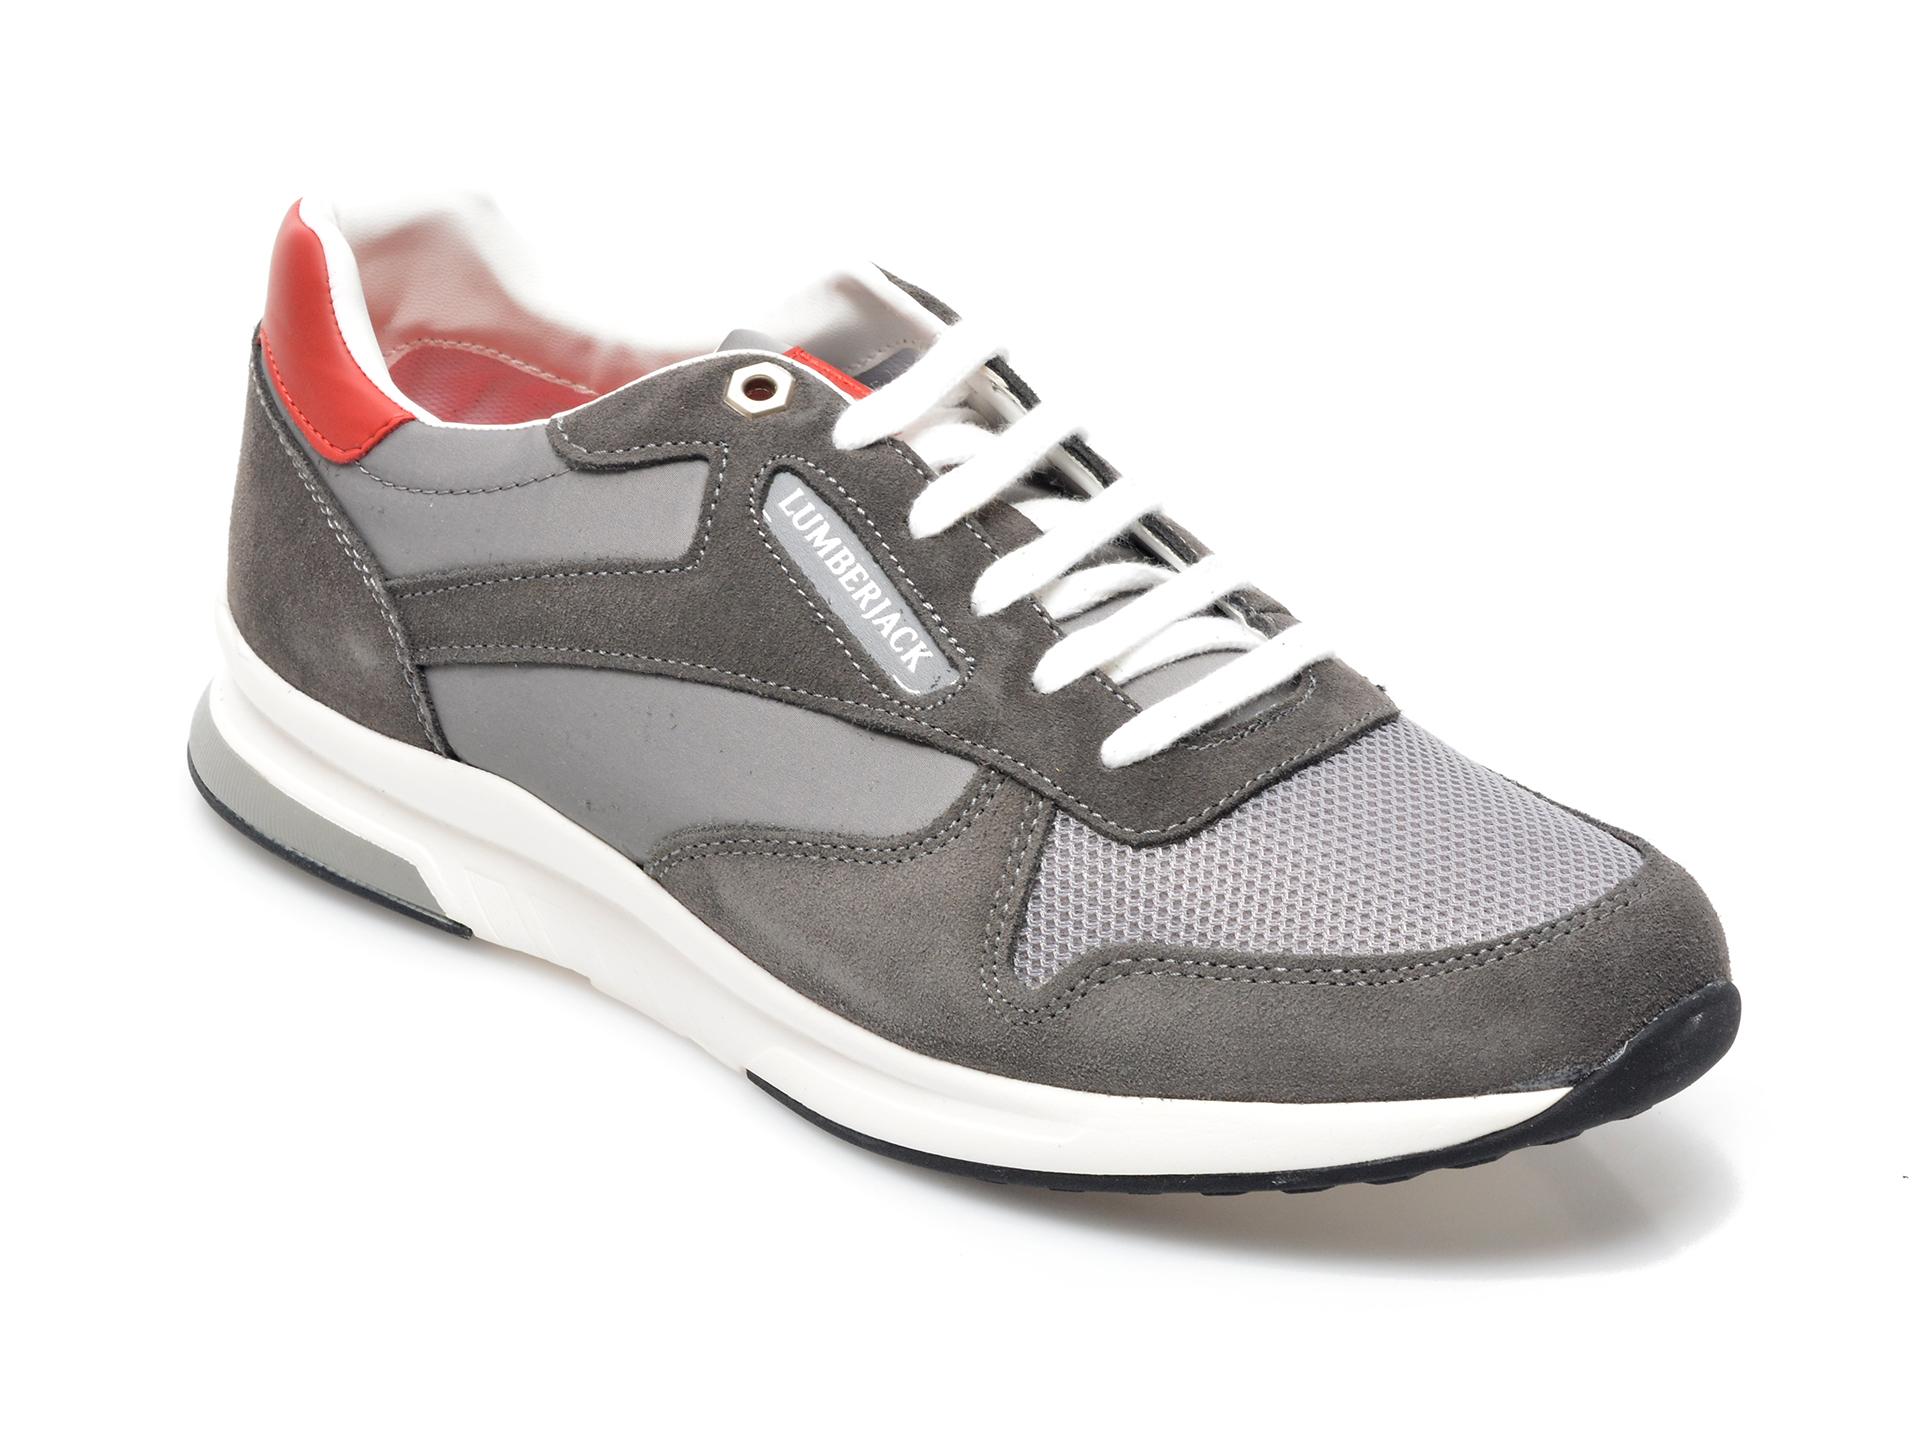 Pantofi Sport Lumberjack Gri, 8701001, Din Material Textil Si Piele Intoarsa